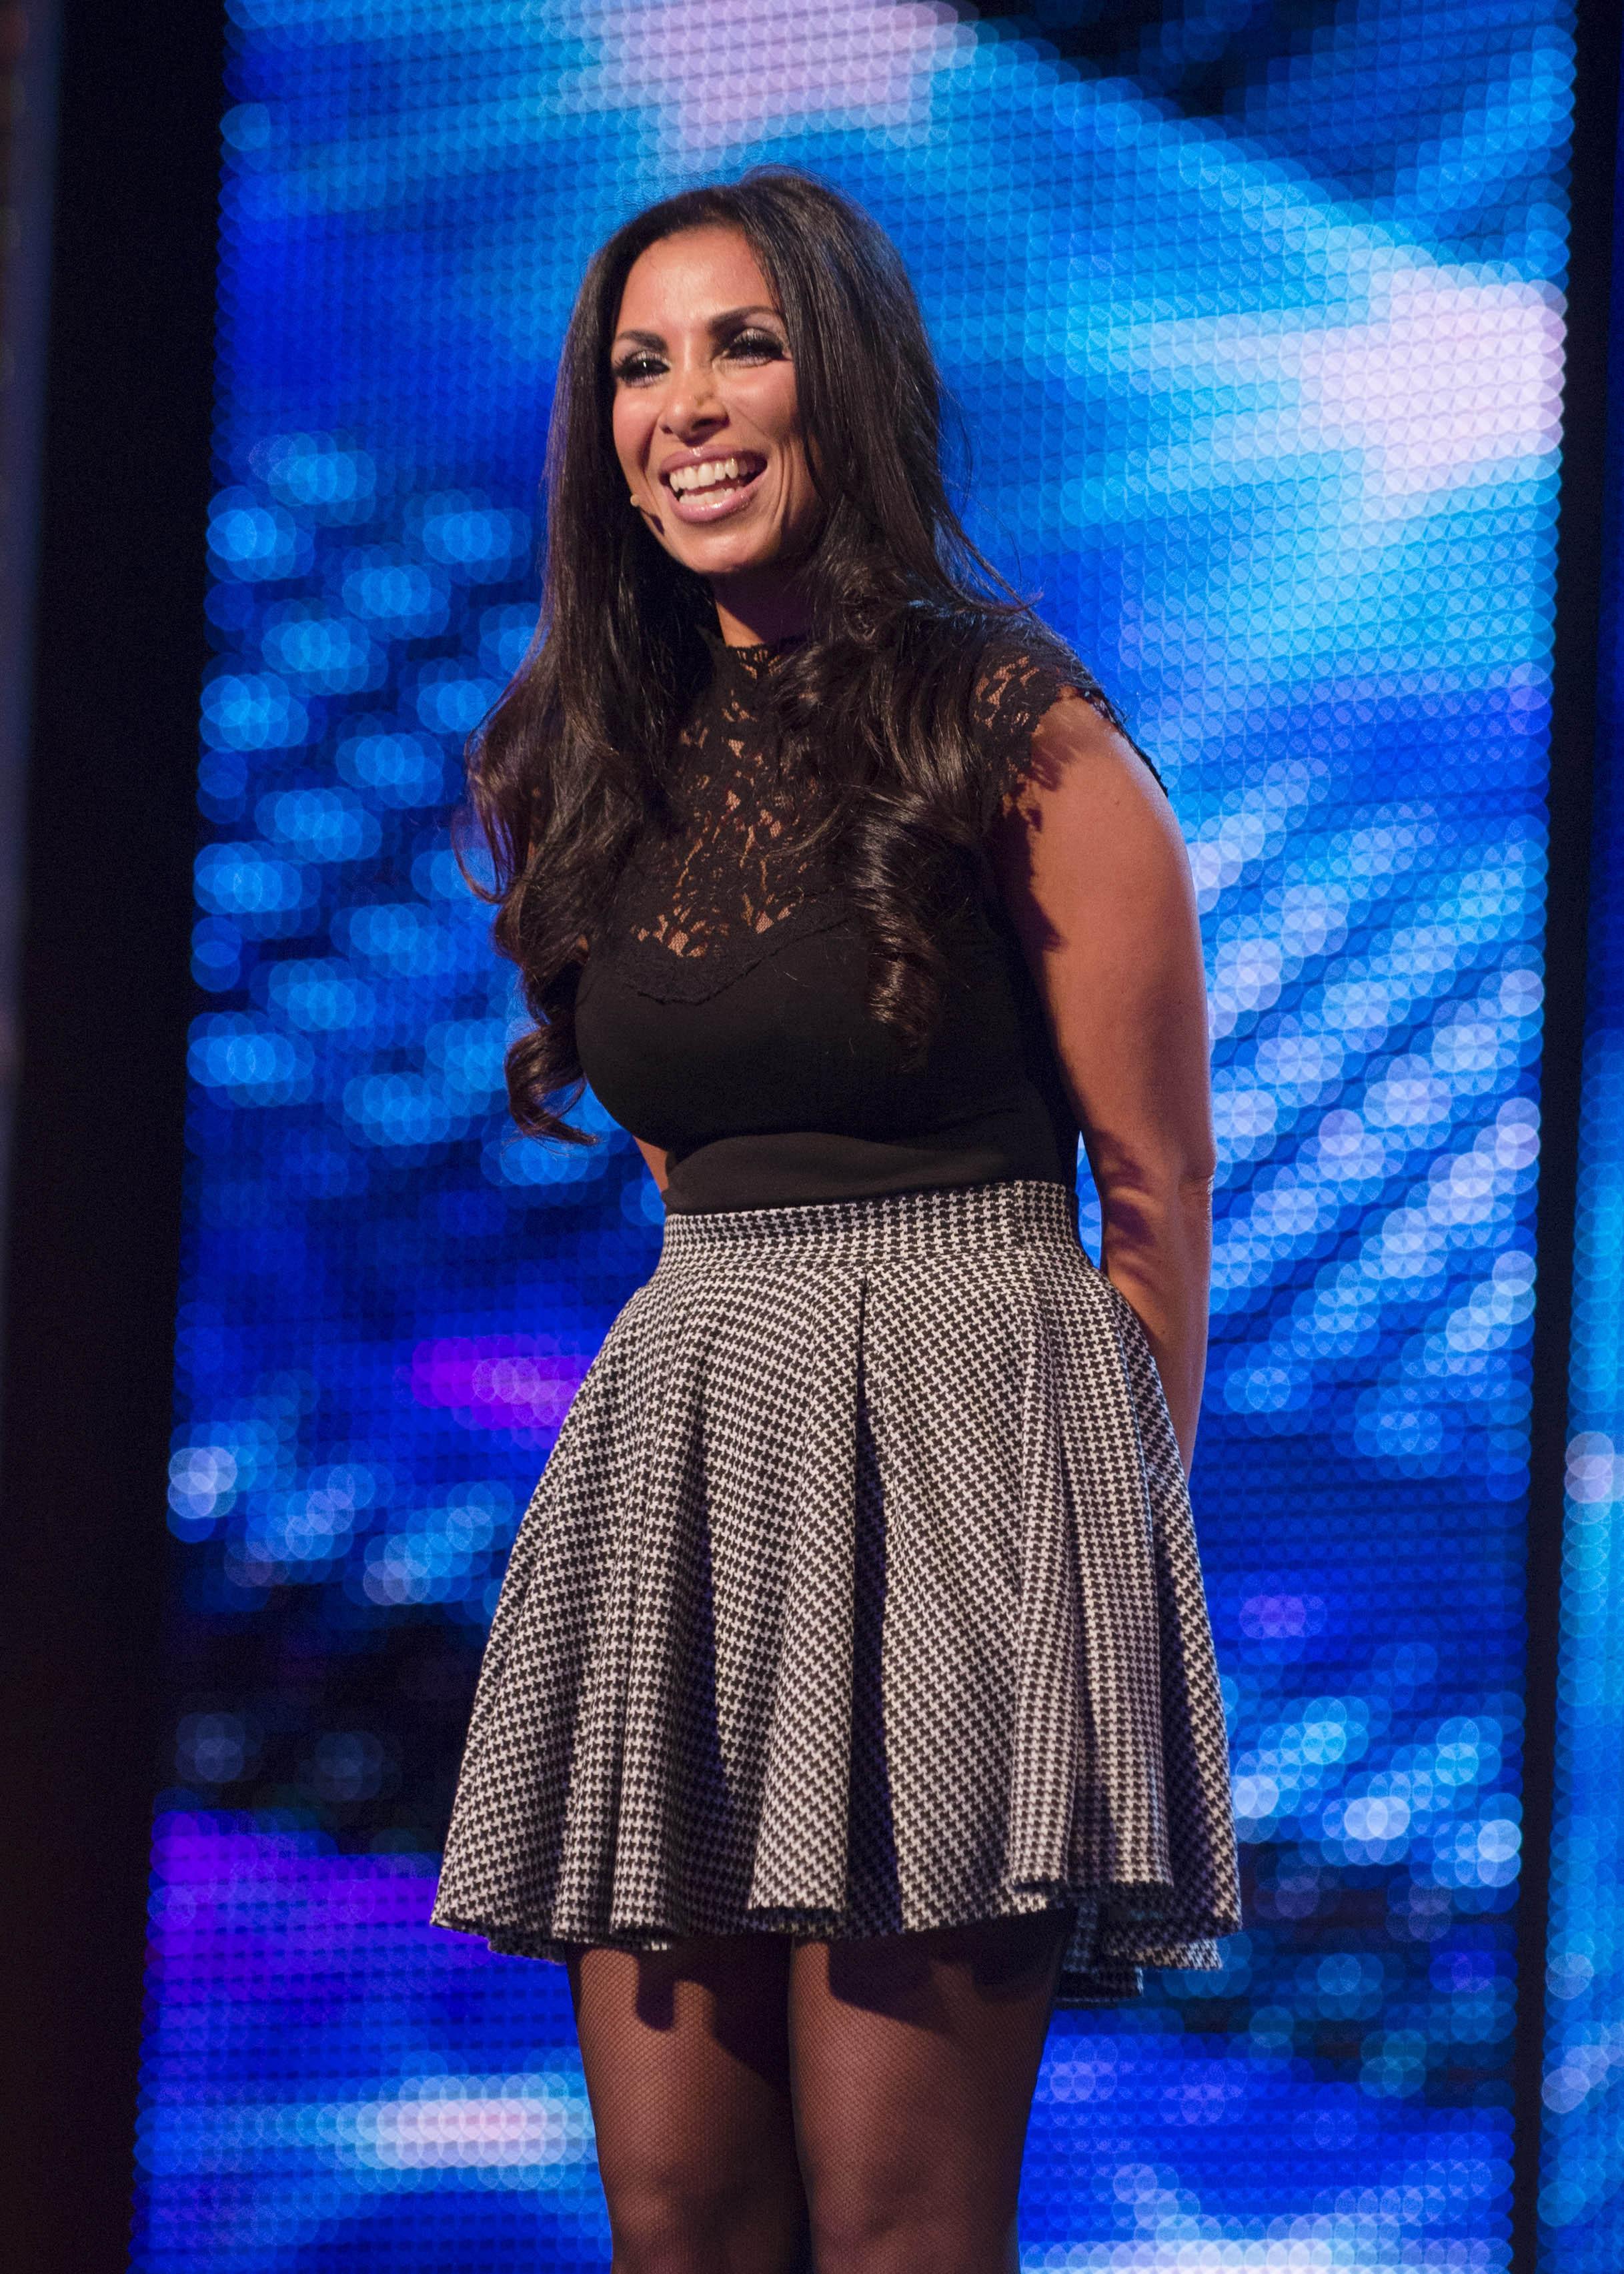 Britain's Got Talent favourite Francine Lewis slams old friend Katie Price